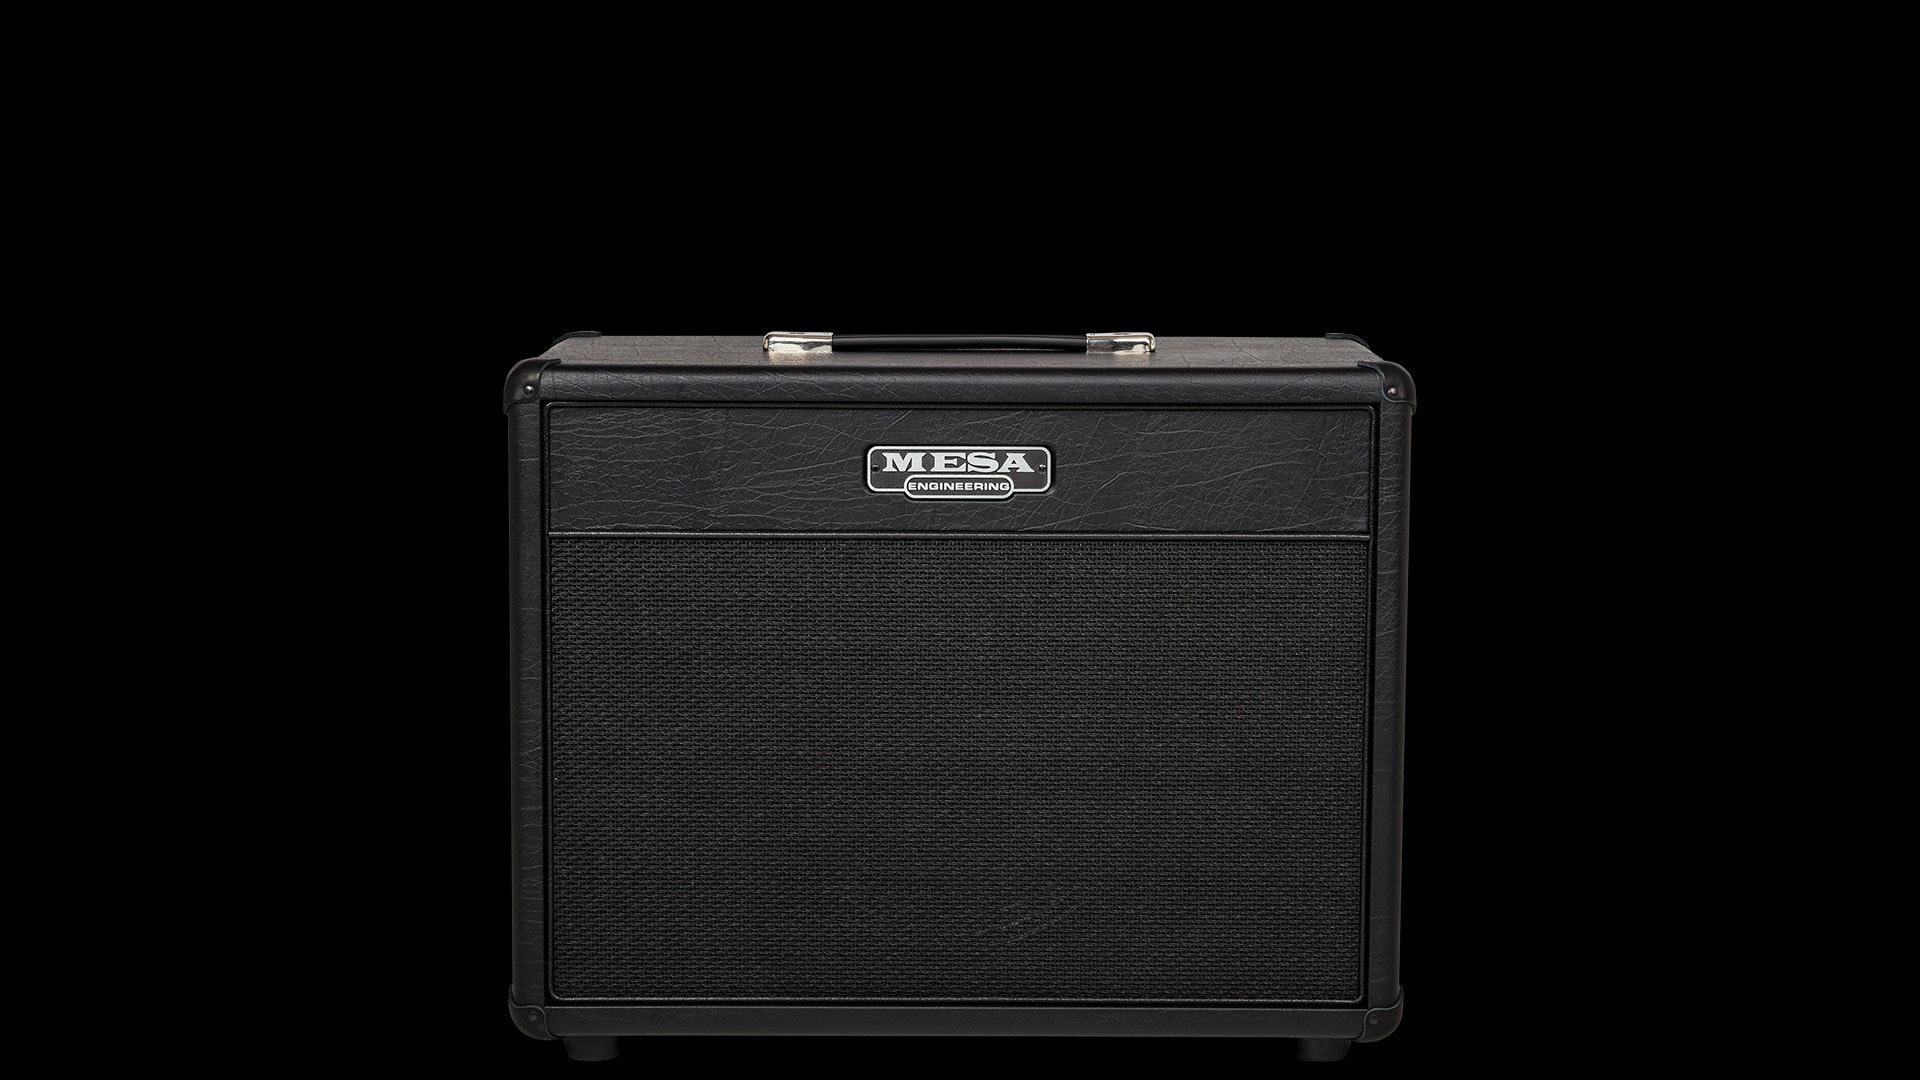 Pleasing 1X12 Lone Star 23 Guitar Amplifier Cabinet Mesa Boogie Download Free Architecture Designs Embacsunscenecom